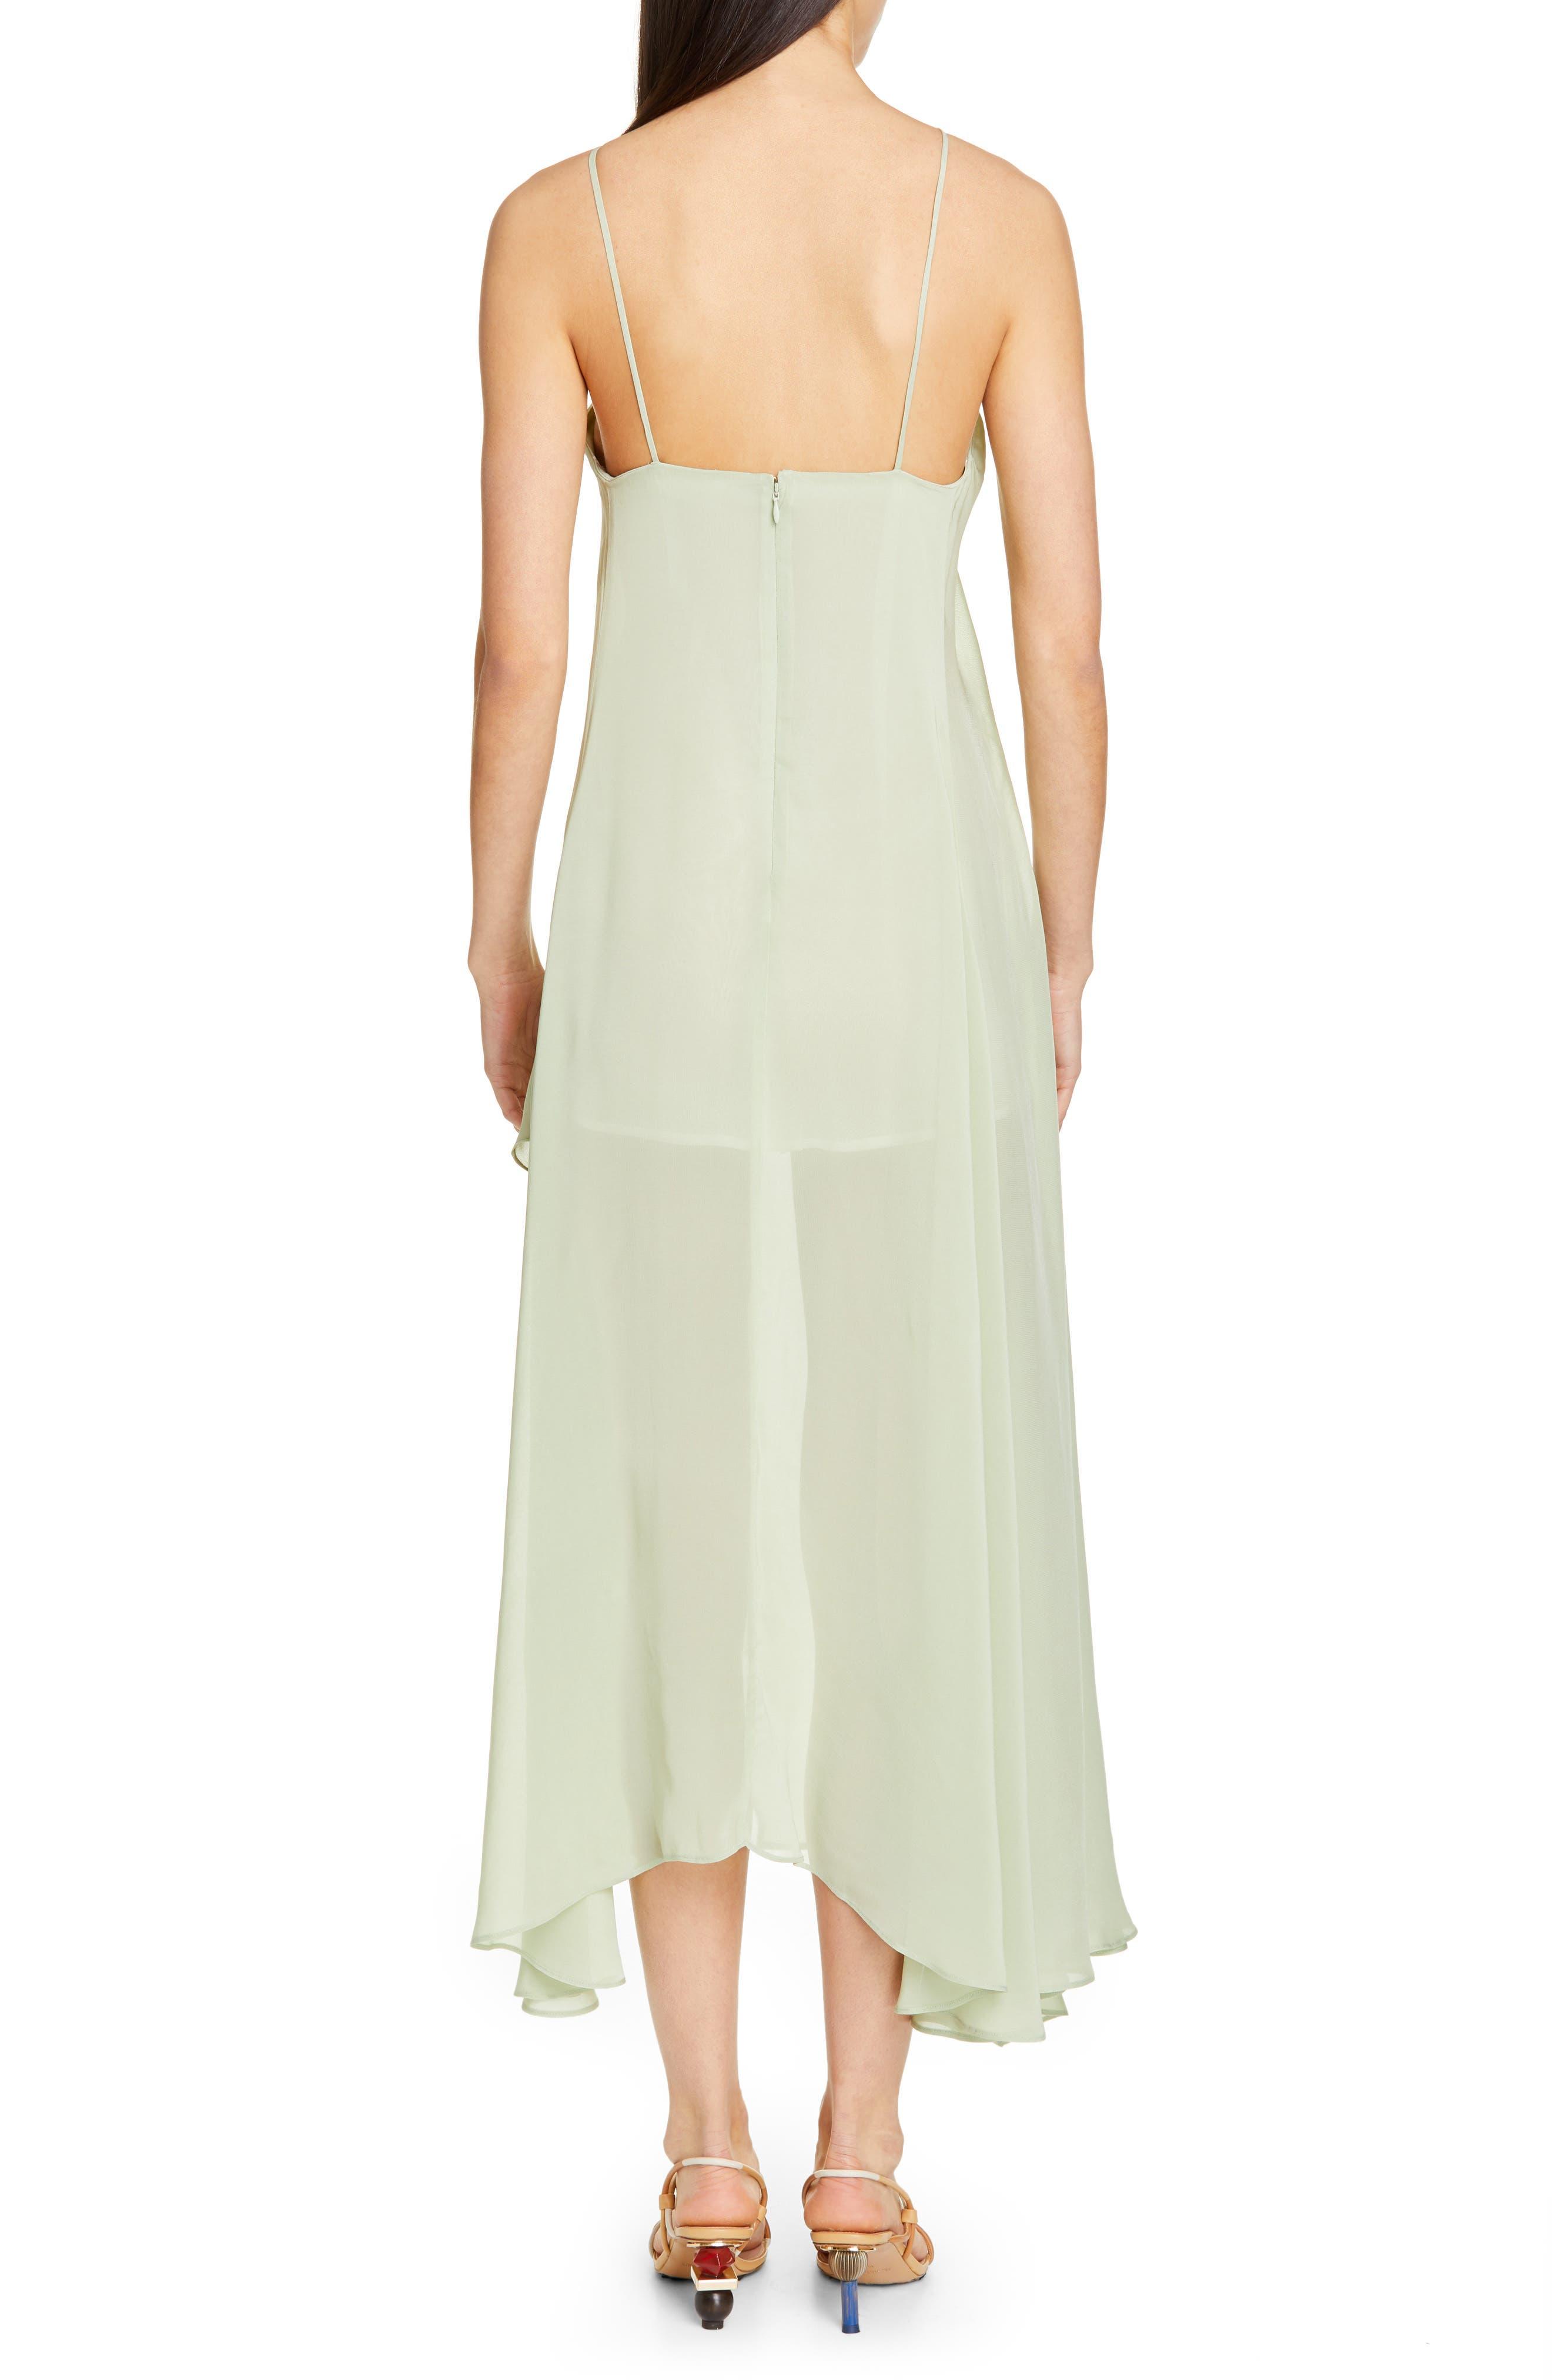 La Robe Spiaggia Halter Dress,                             Alternate thumbnail 2, color,                             LIGHT GREEN